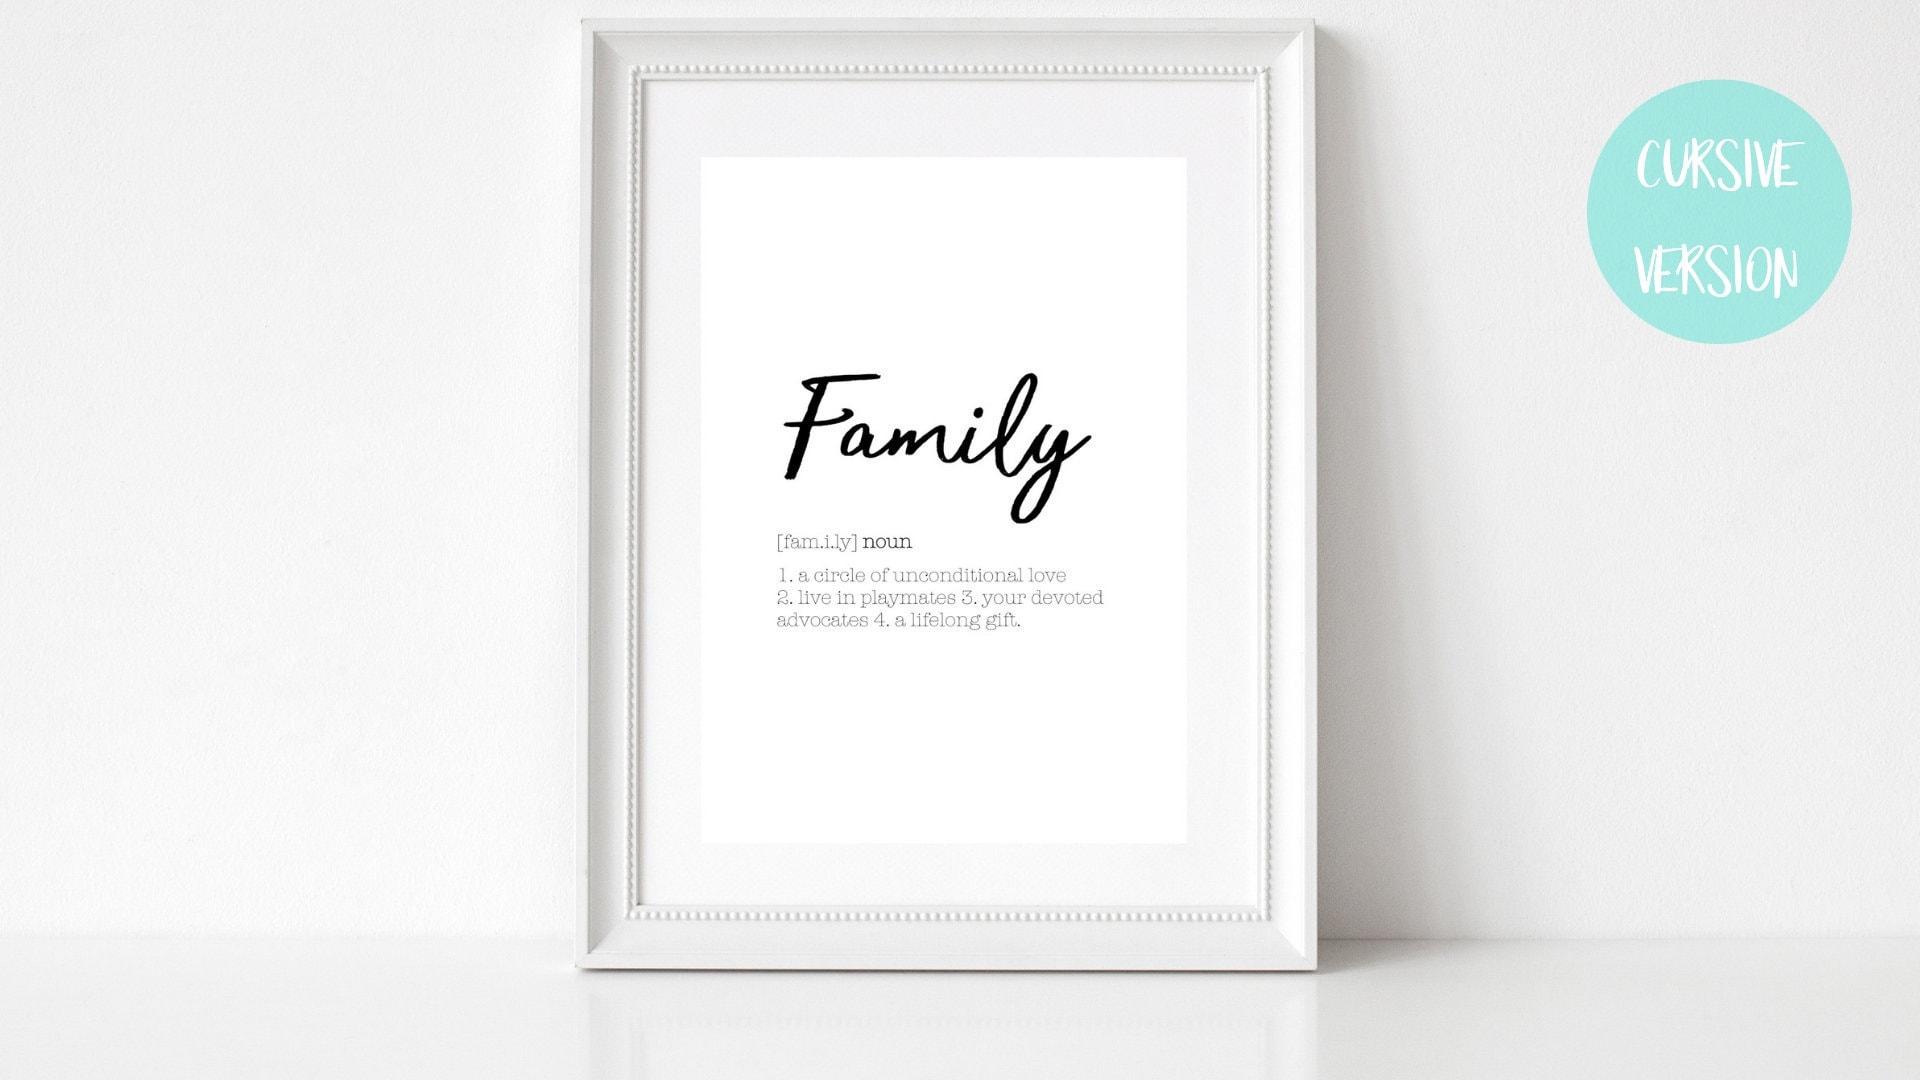 LOVE DEFINITION PRINT FAMILY GIFT BLACK WHITE A4 HOME GIFT PRINTS DECOR